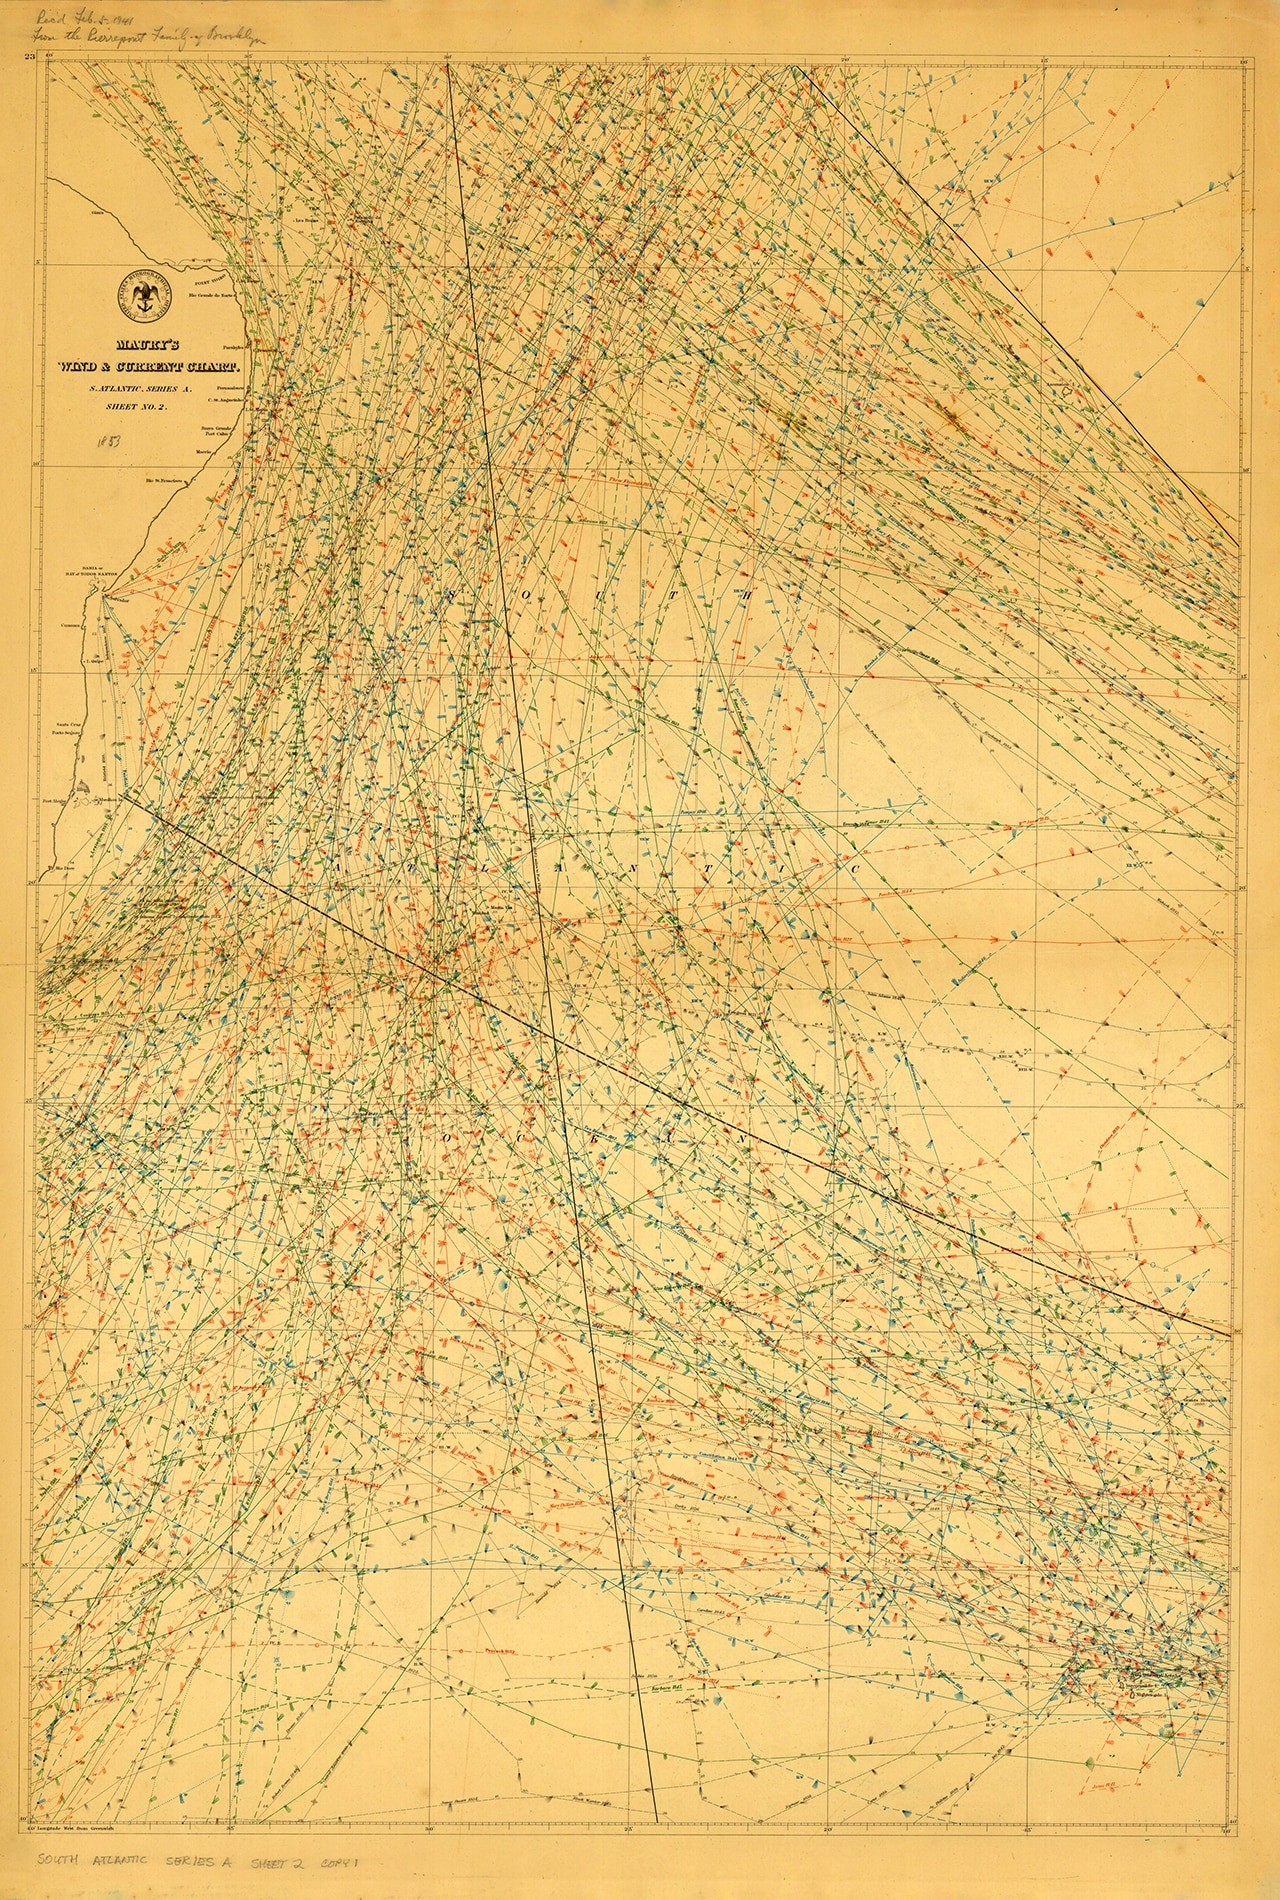 Interactive Bosphorus Strait Map on sardis map, negev desert map, caucasus mountains map, hellespont map, istanbul map, dead sea map, balkans map, andes mountains map, caspian sea map, middle east map, yalta map, pyrenees mountains map, black sea map, carpathian mountains map, english channel map, suez canal map, dardanelles map, ephesus map, syrian desert map, athens map,